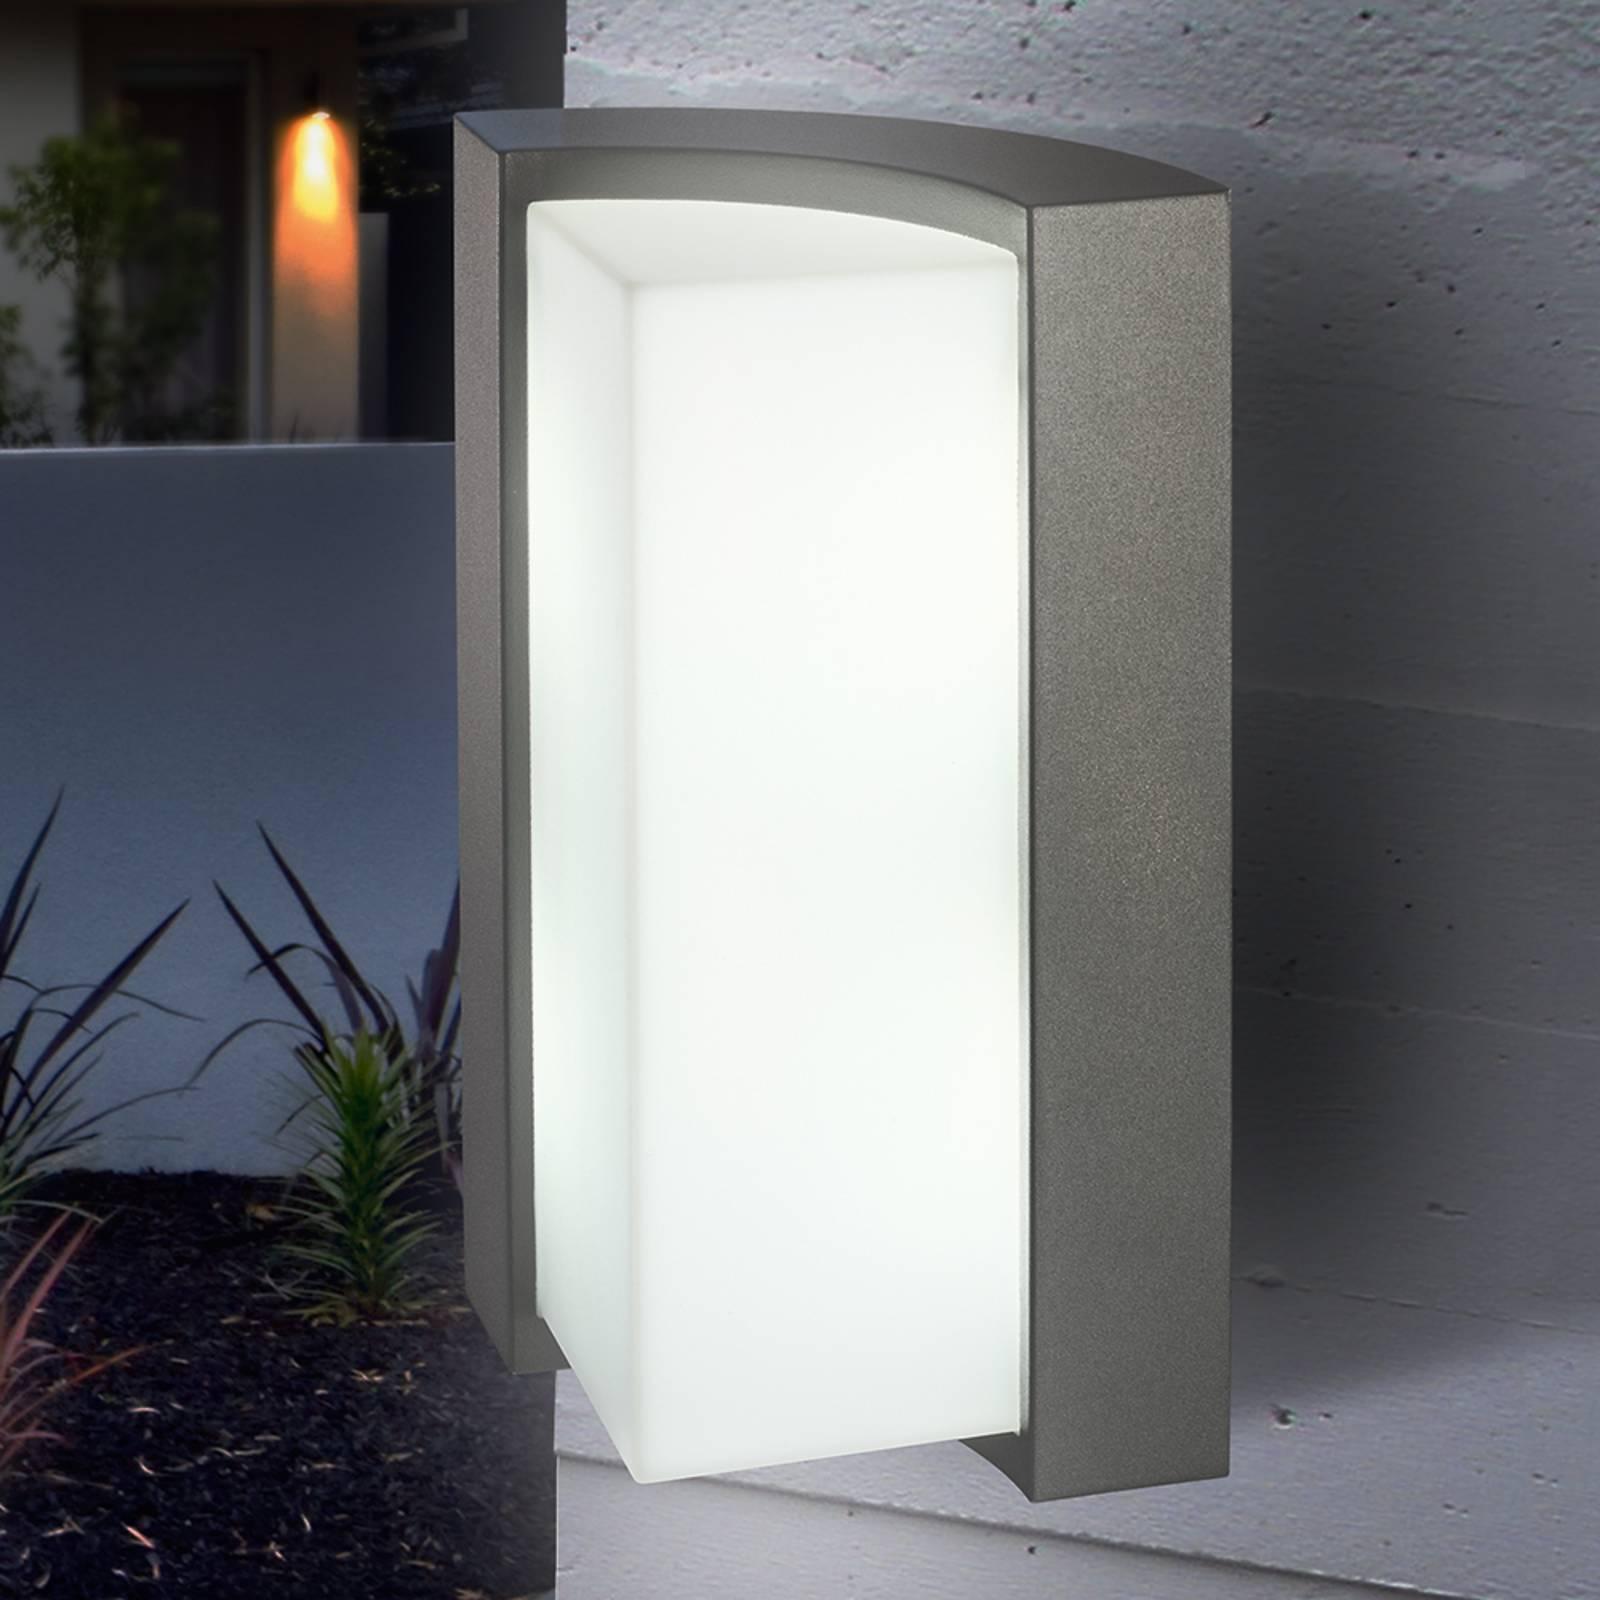 TIRANO moderne buitenwandlamp met leds